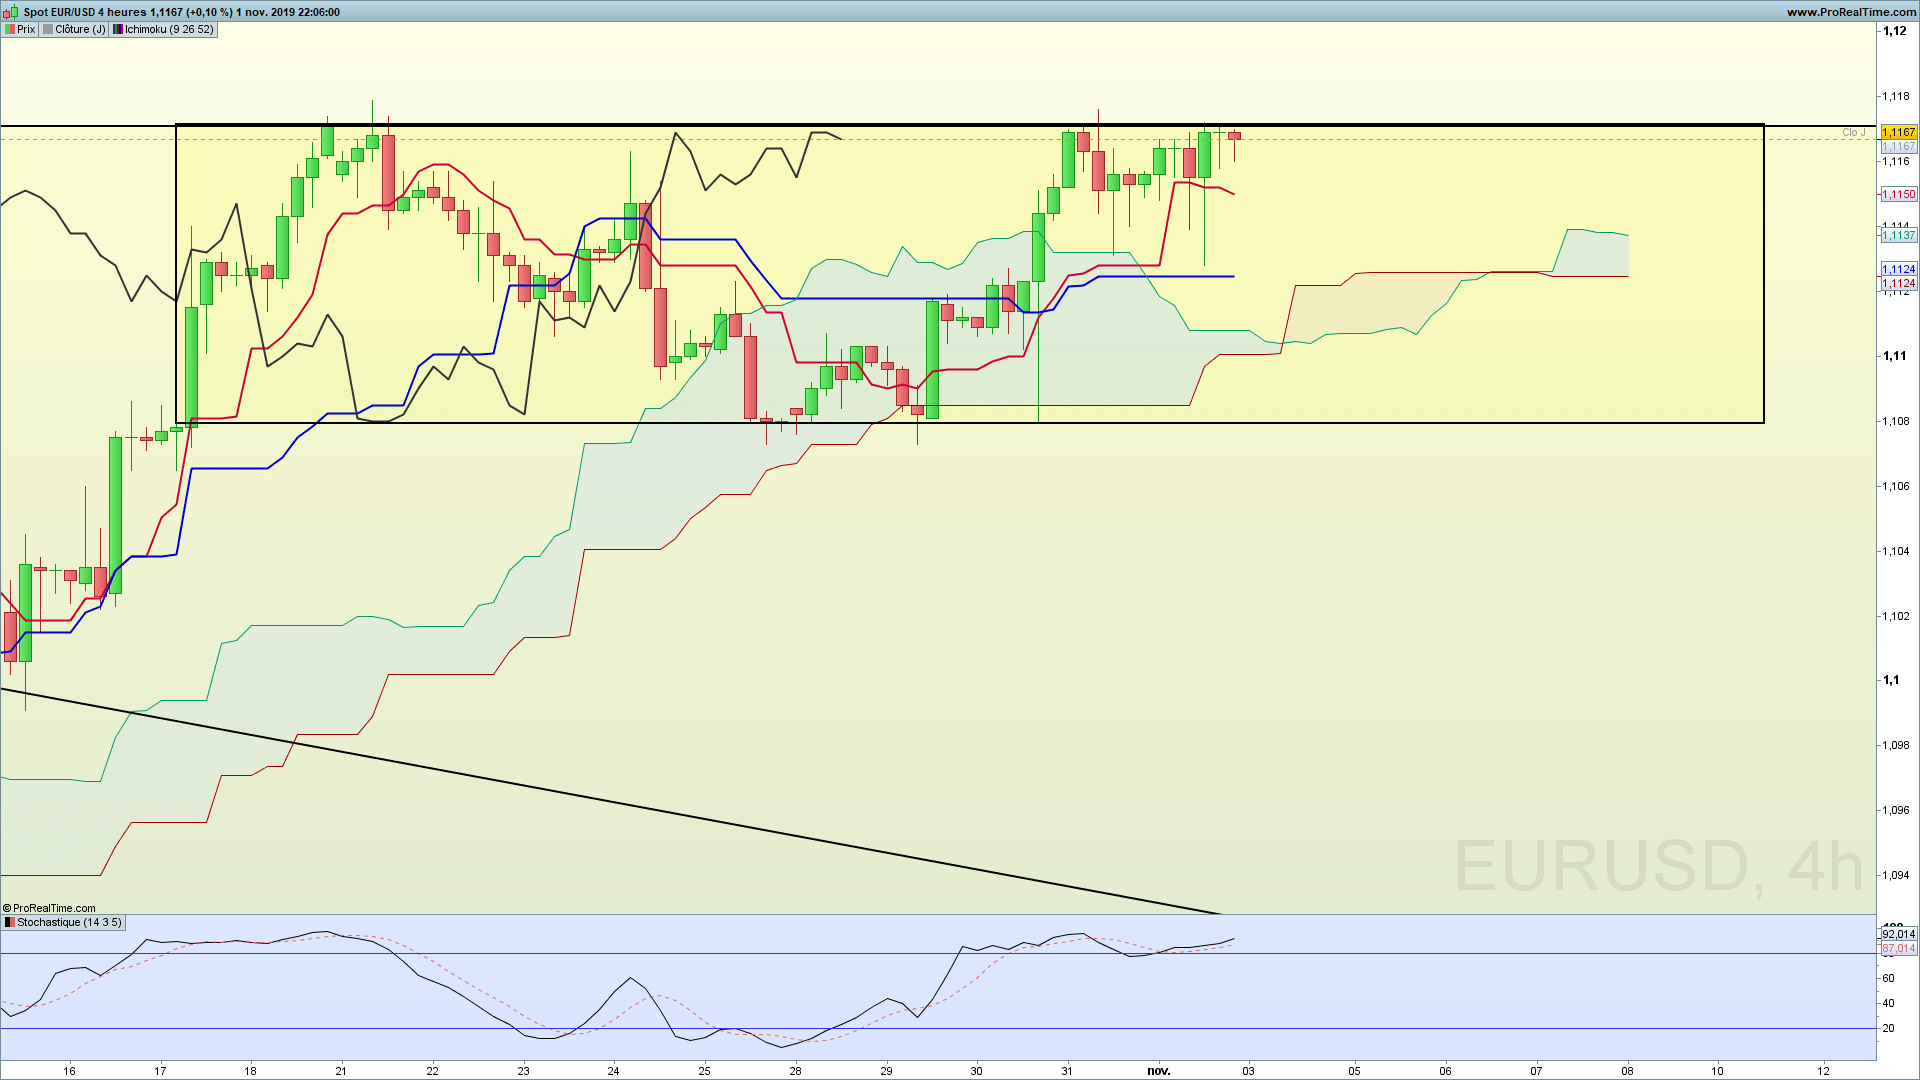 EURUSD Trading Plan 03/11/2019